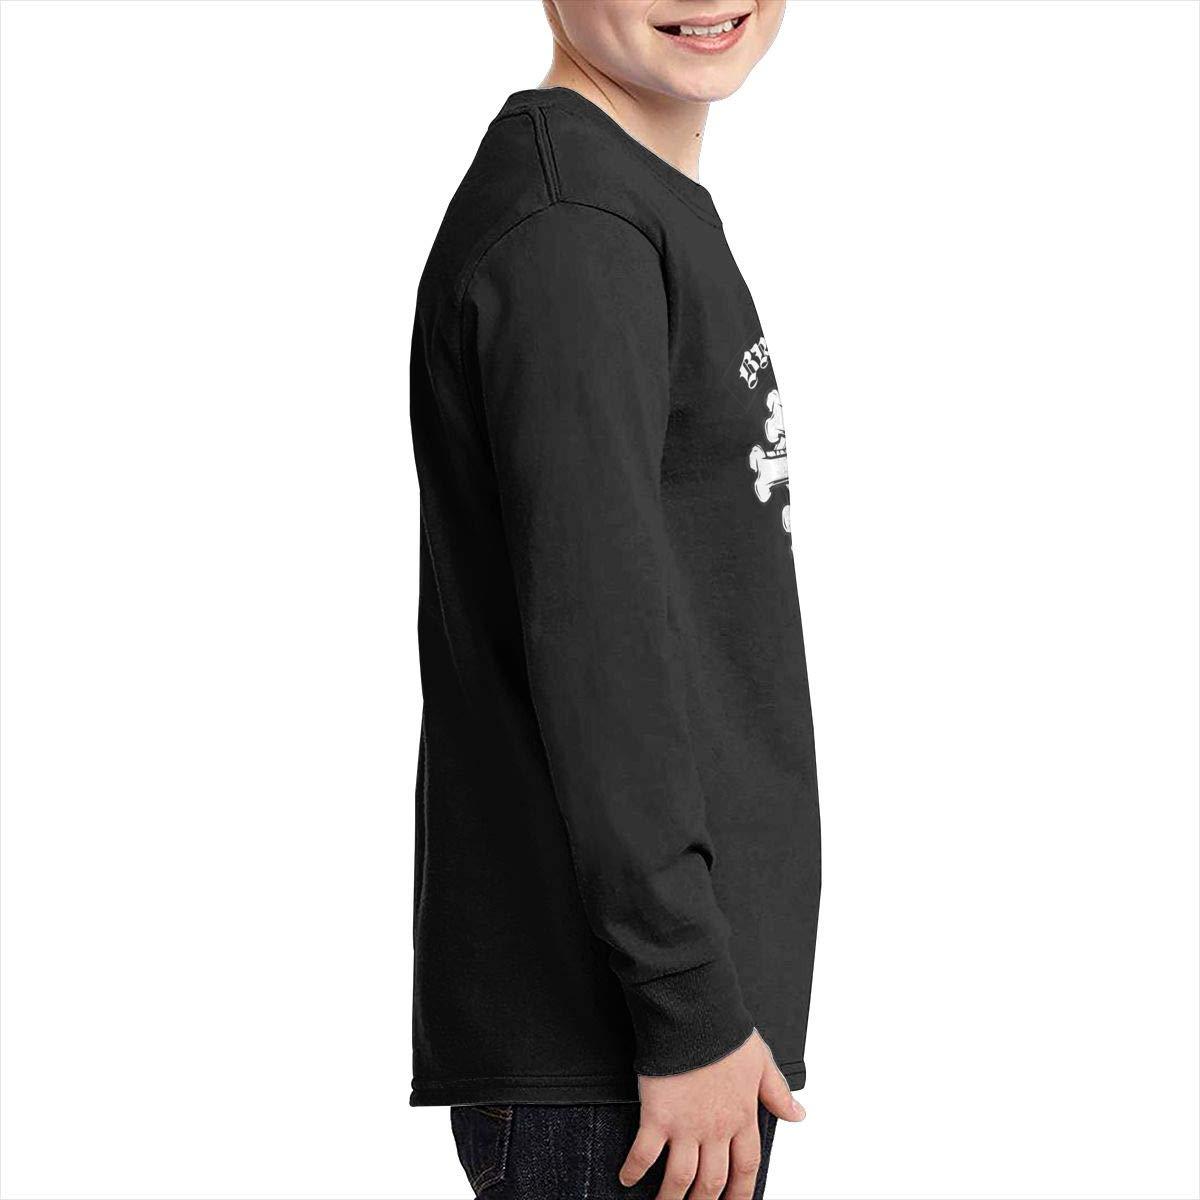 YouNood Youth Junior Funny Broken Skull Ranch Long Sleeve Tshirts Black